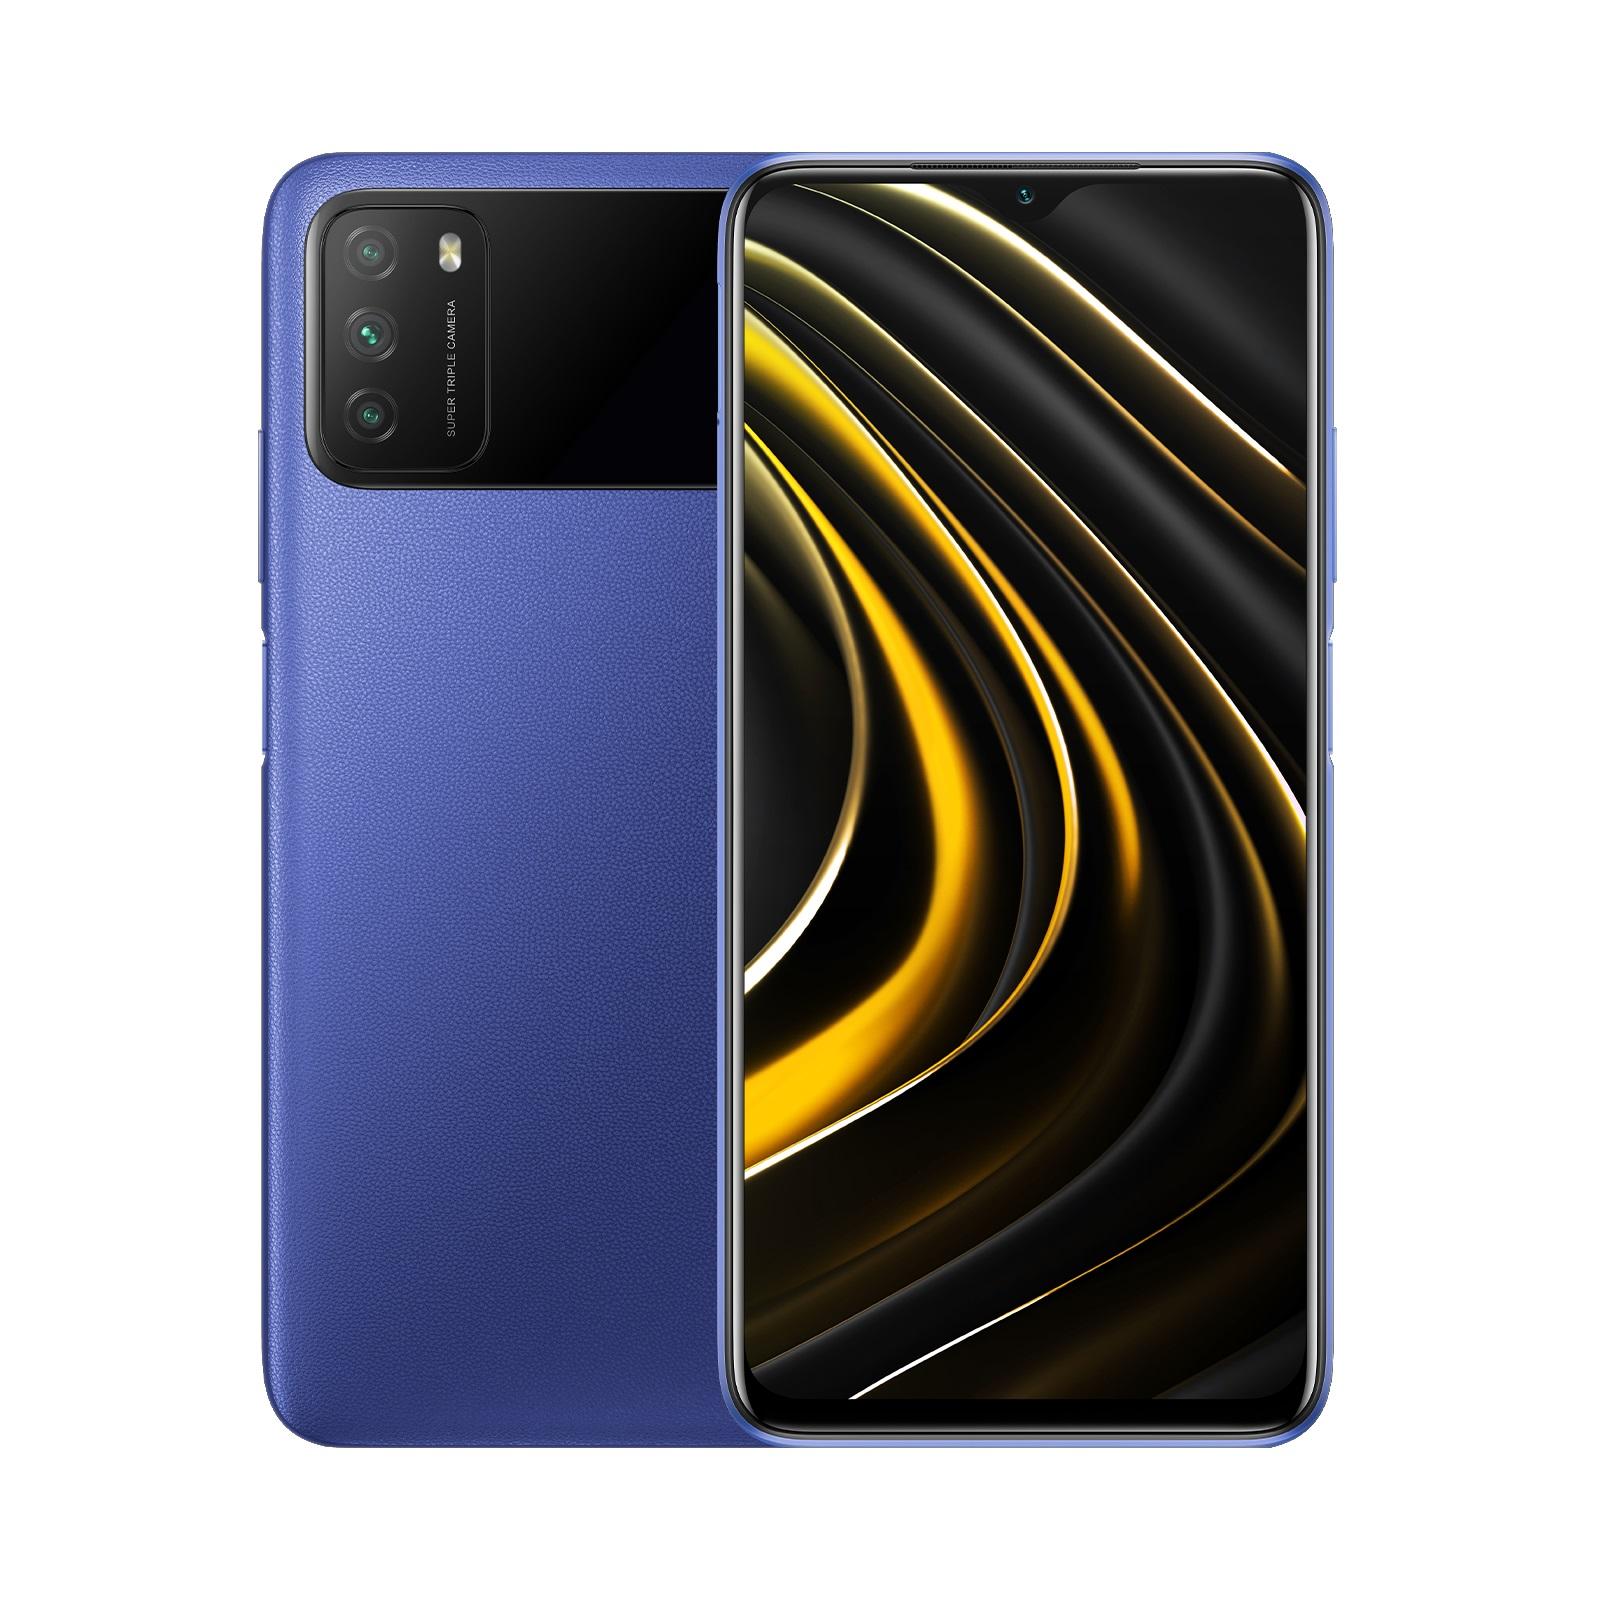 Дисплей смартфона Xiaomi Poco M3: 6.53 дюйма (2340 x 1080). Камеры (задние): 48 (12) / 2/2 Мпикс. Размеры: 160,4 x 77,2 x 10,7 мм. Память: 128 GB / 512 GB (microSDXC).